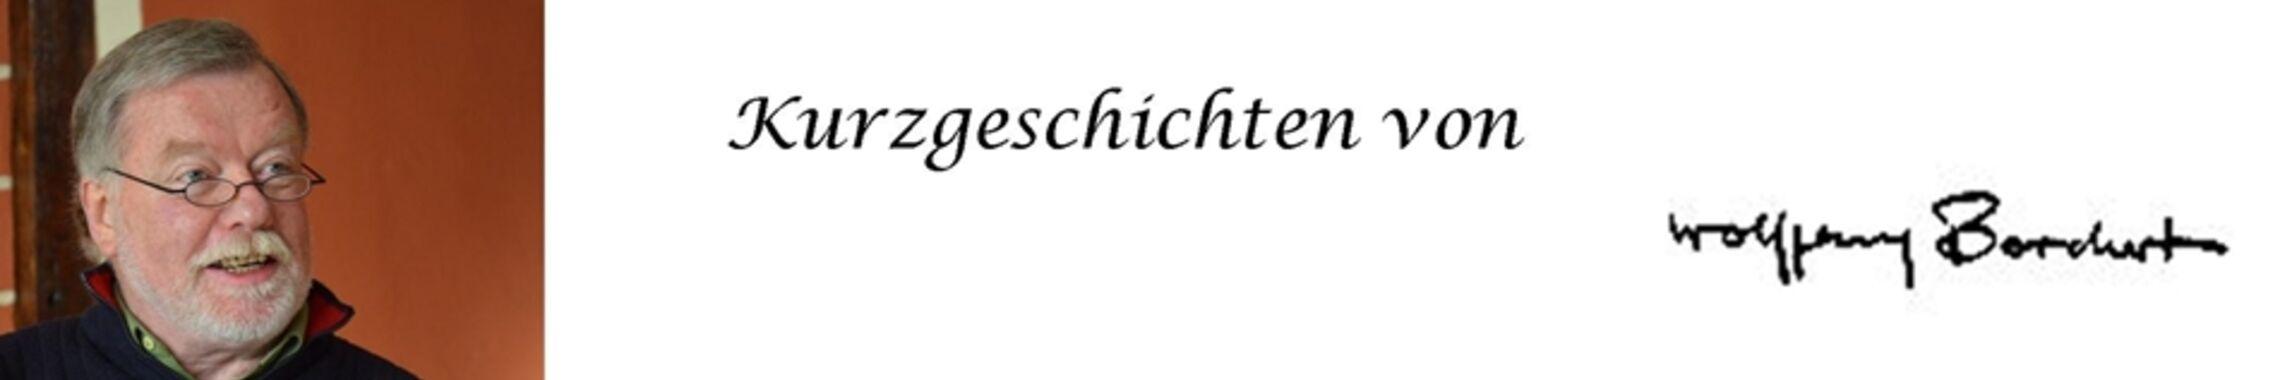 pahlow-titel